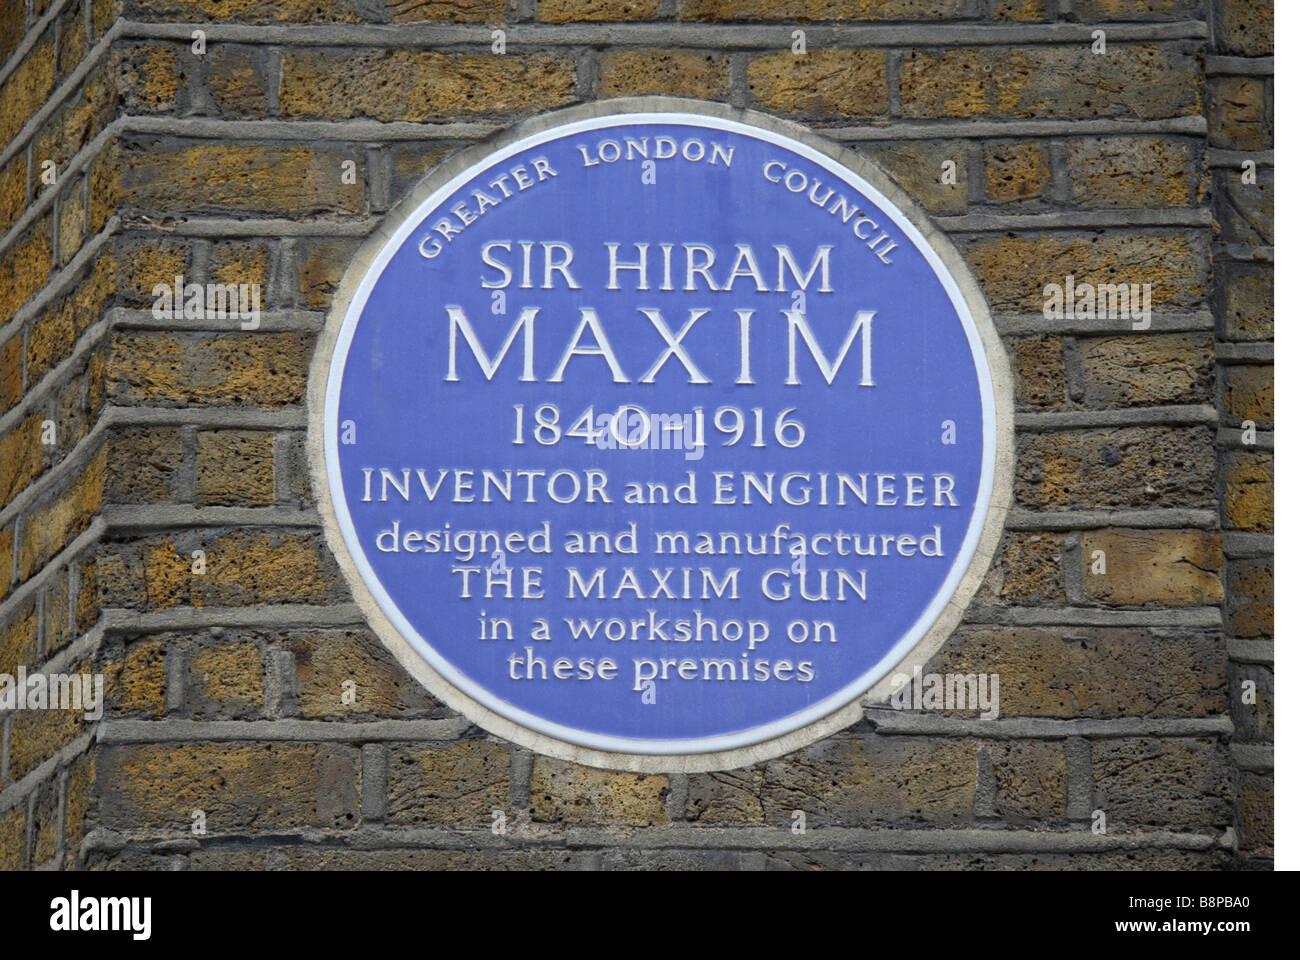 A Blue Plaque (57d Hatton Garden, London) For The Inventor Of The Maxim  Gun, Sir Hiram Maxin, London. Feb 2009